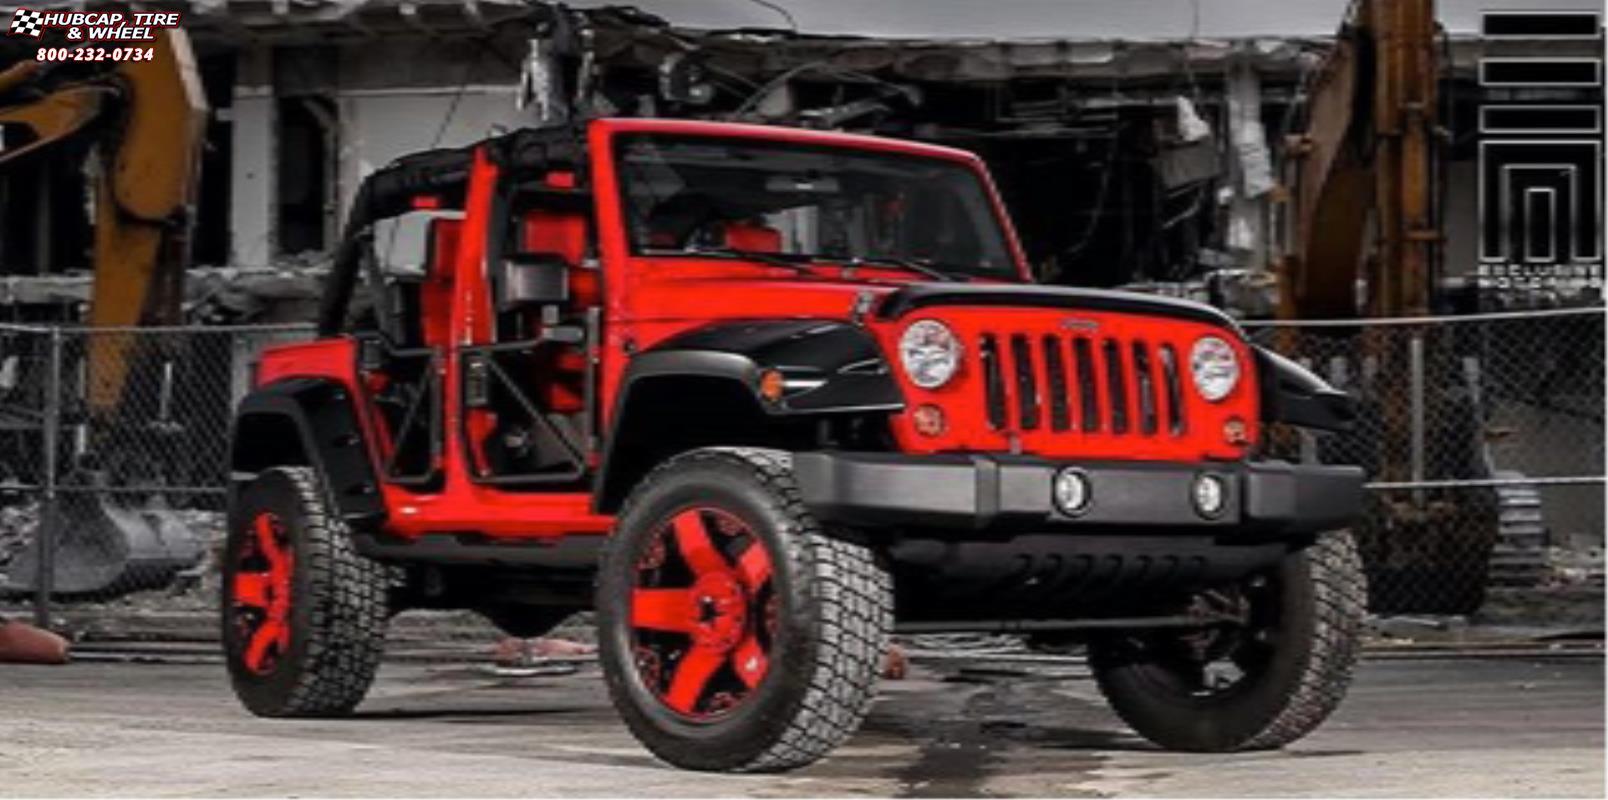 Jeep Wrangler Xd Series Xd775 Rockstar Wheels Matte Black Red